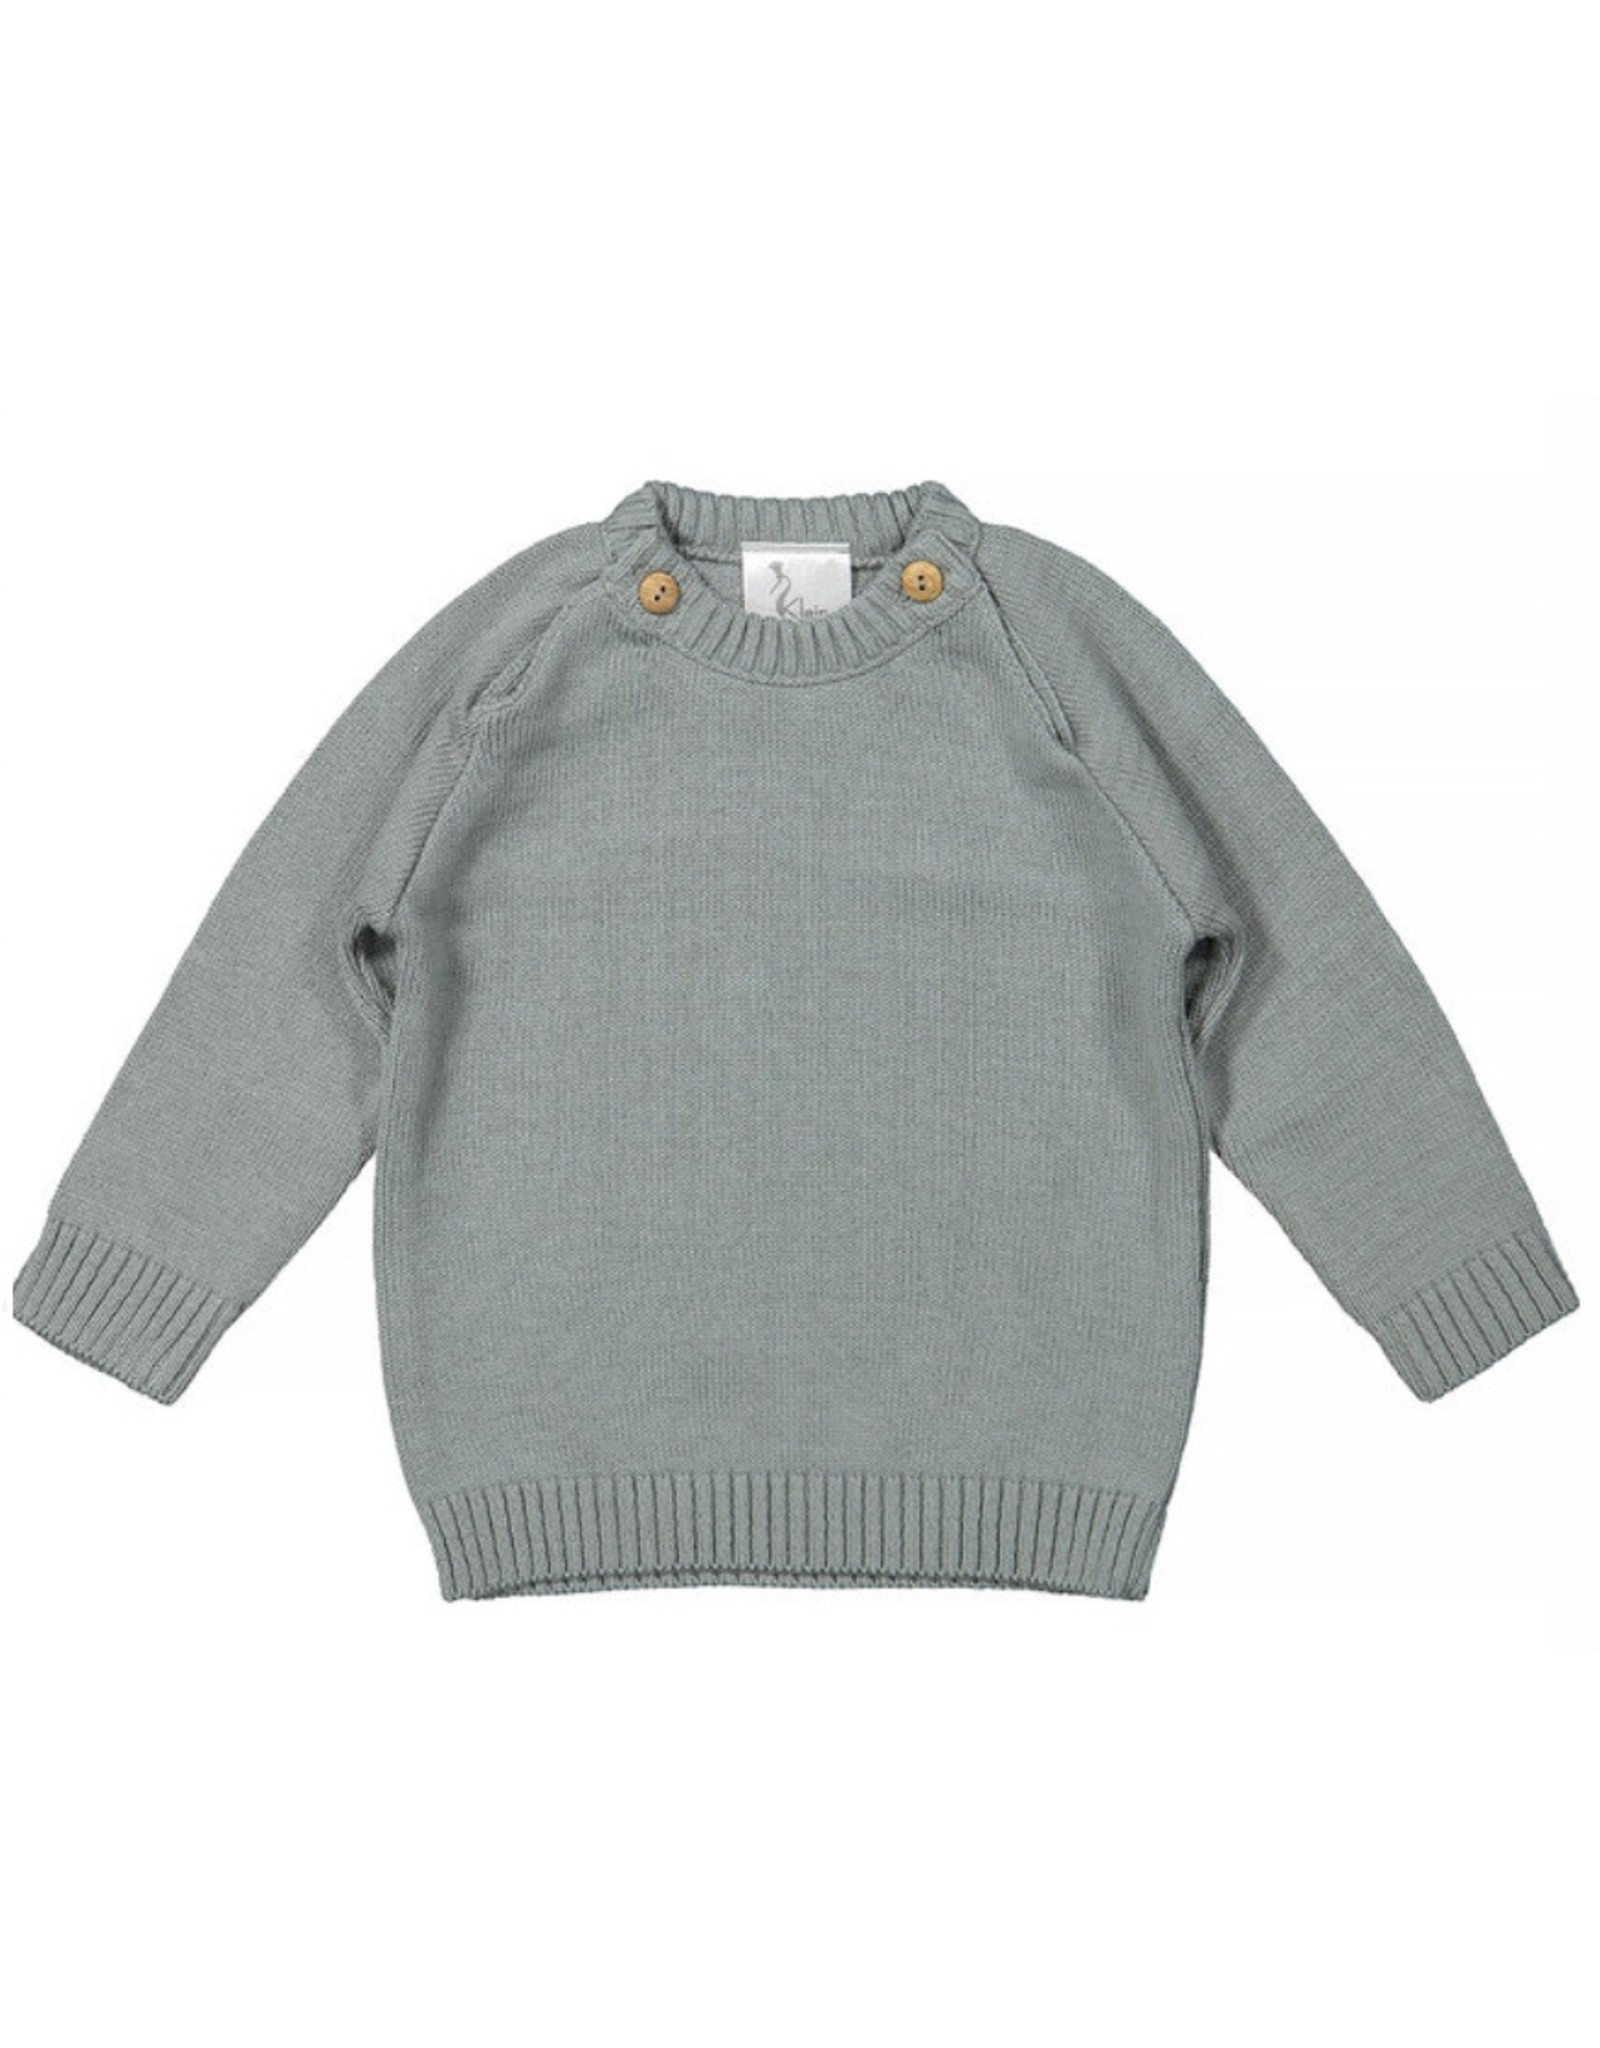 Klein KN002 T-shirt